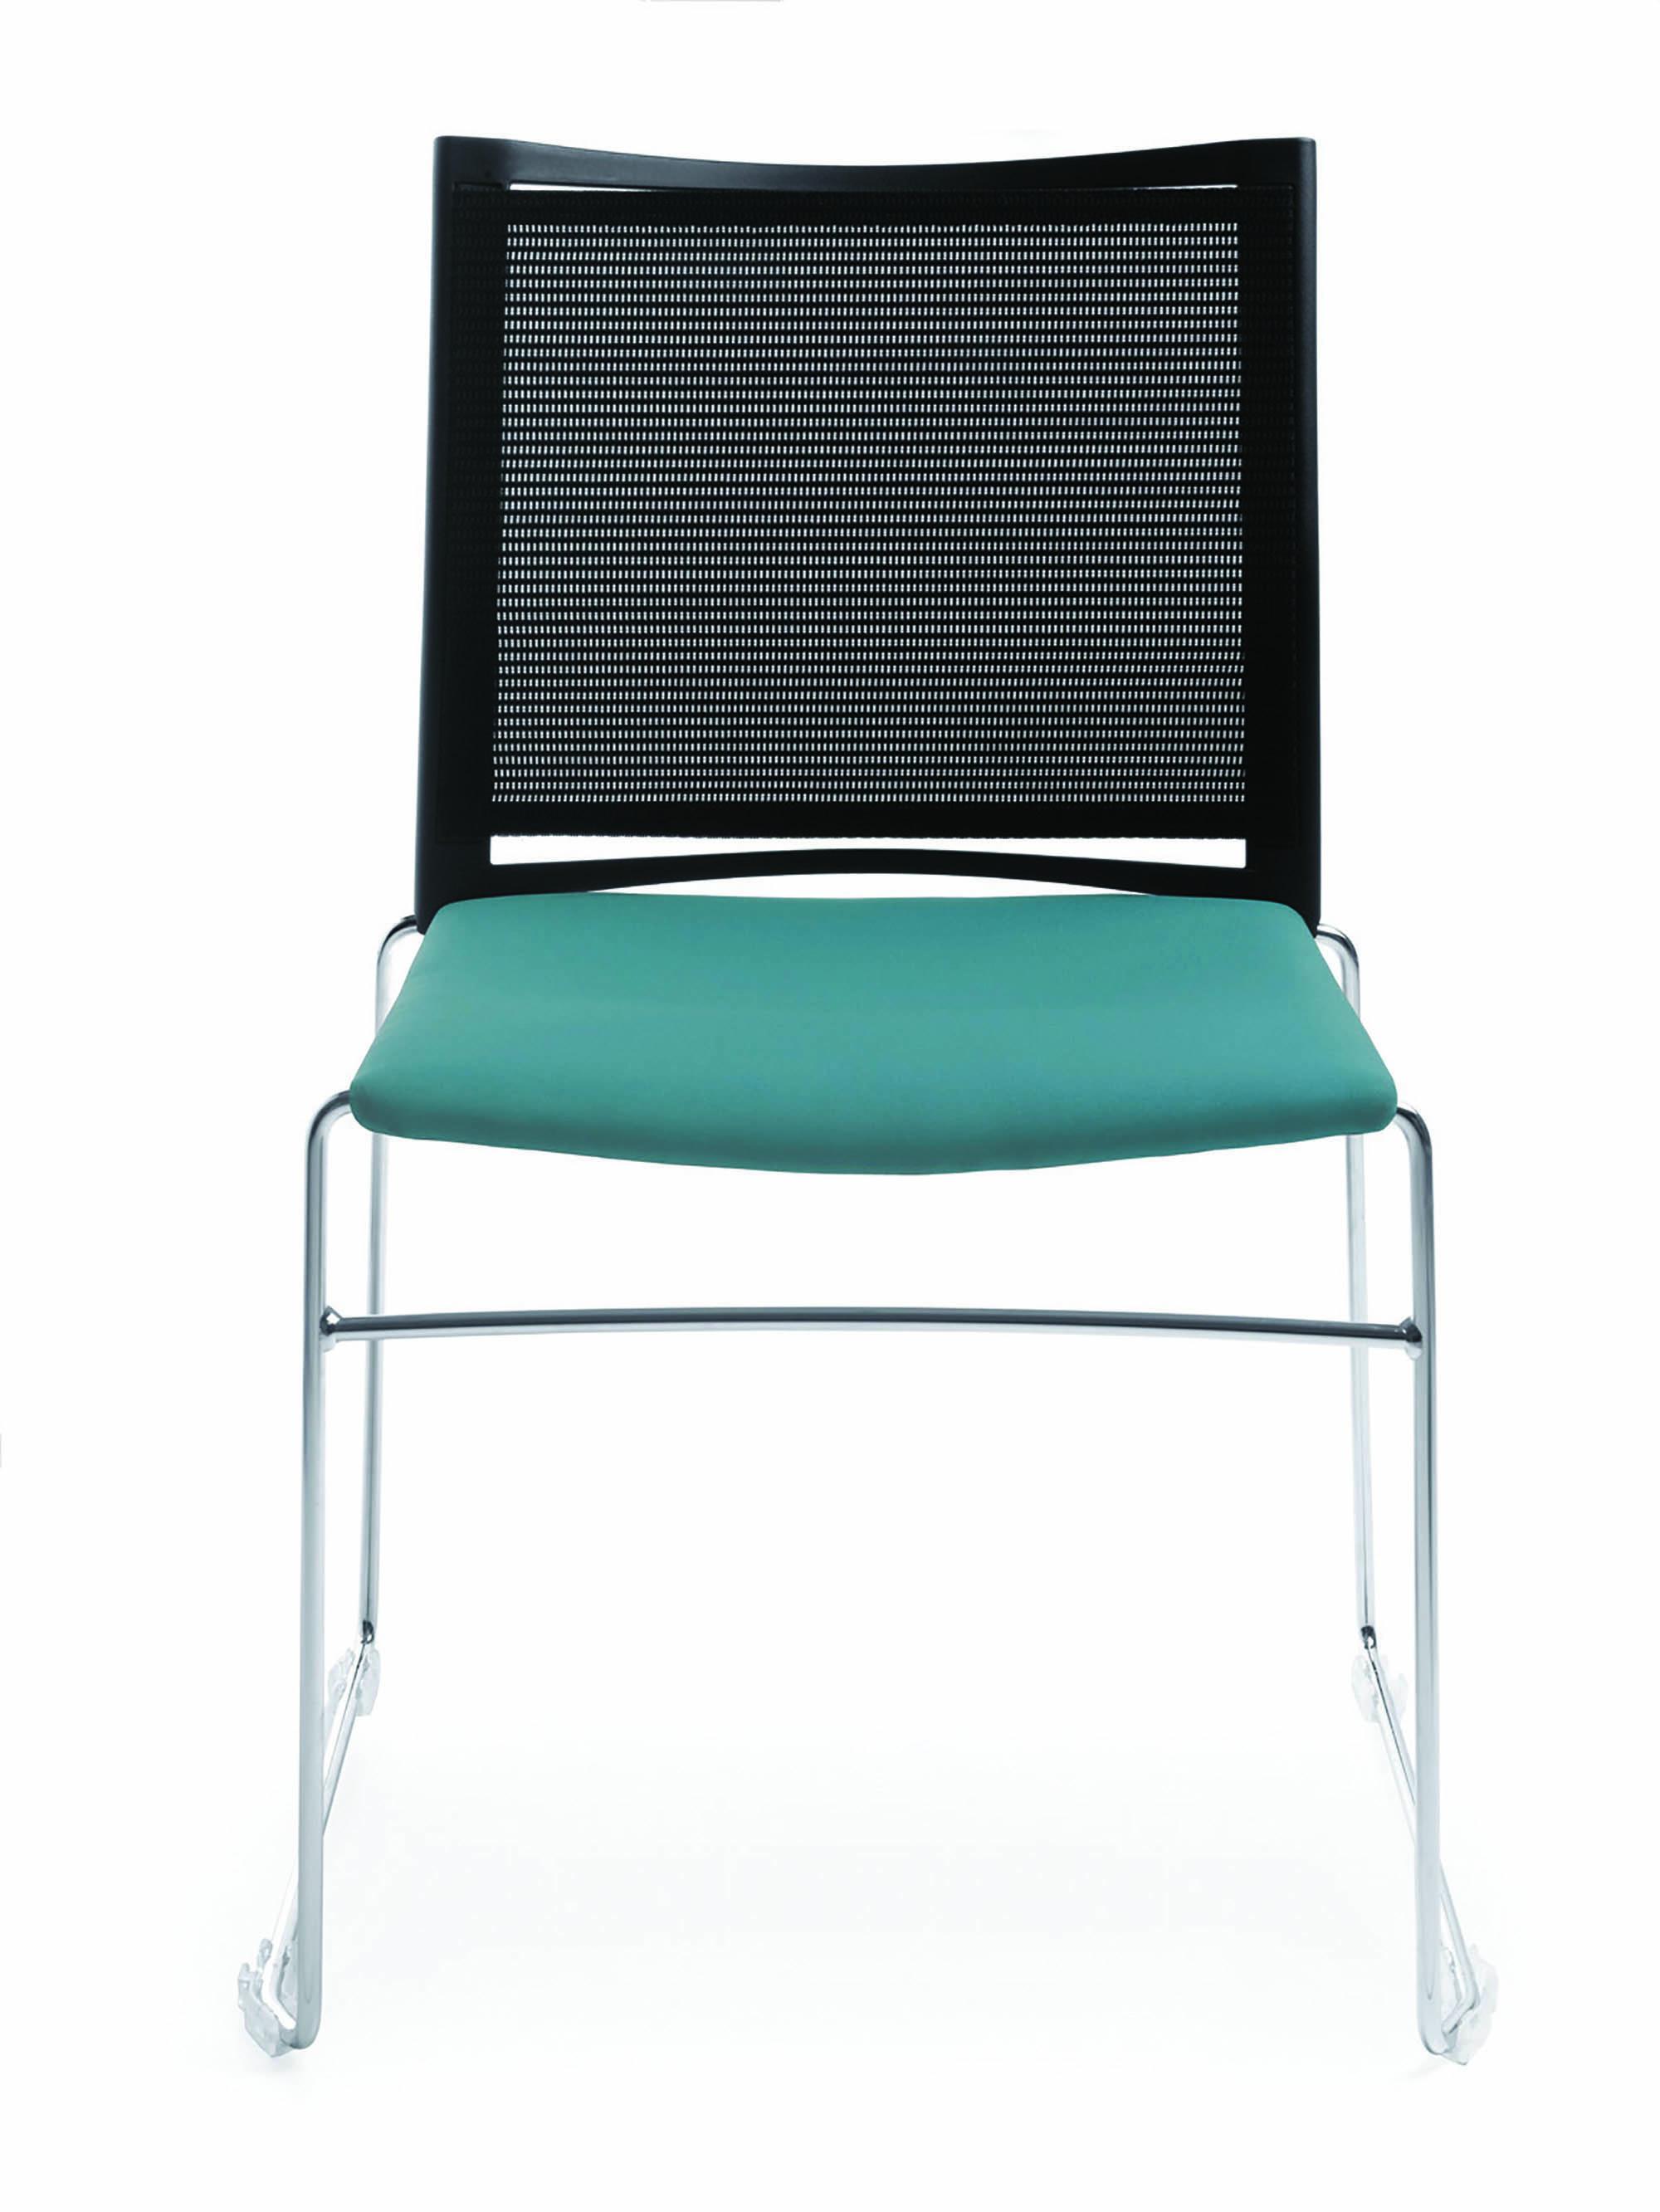 Ariz Bit Amp Dream Officechairs Ie